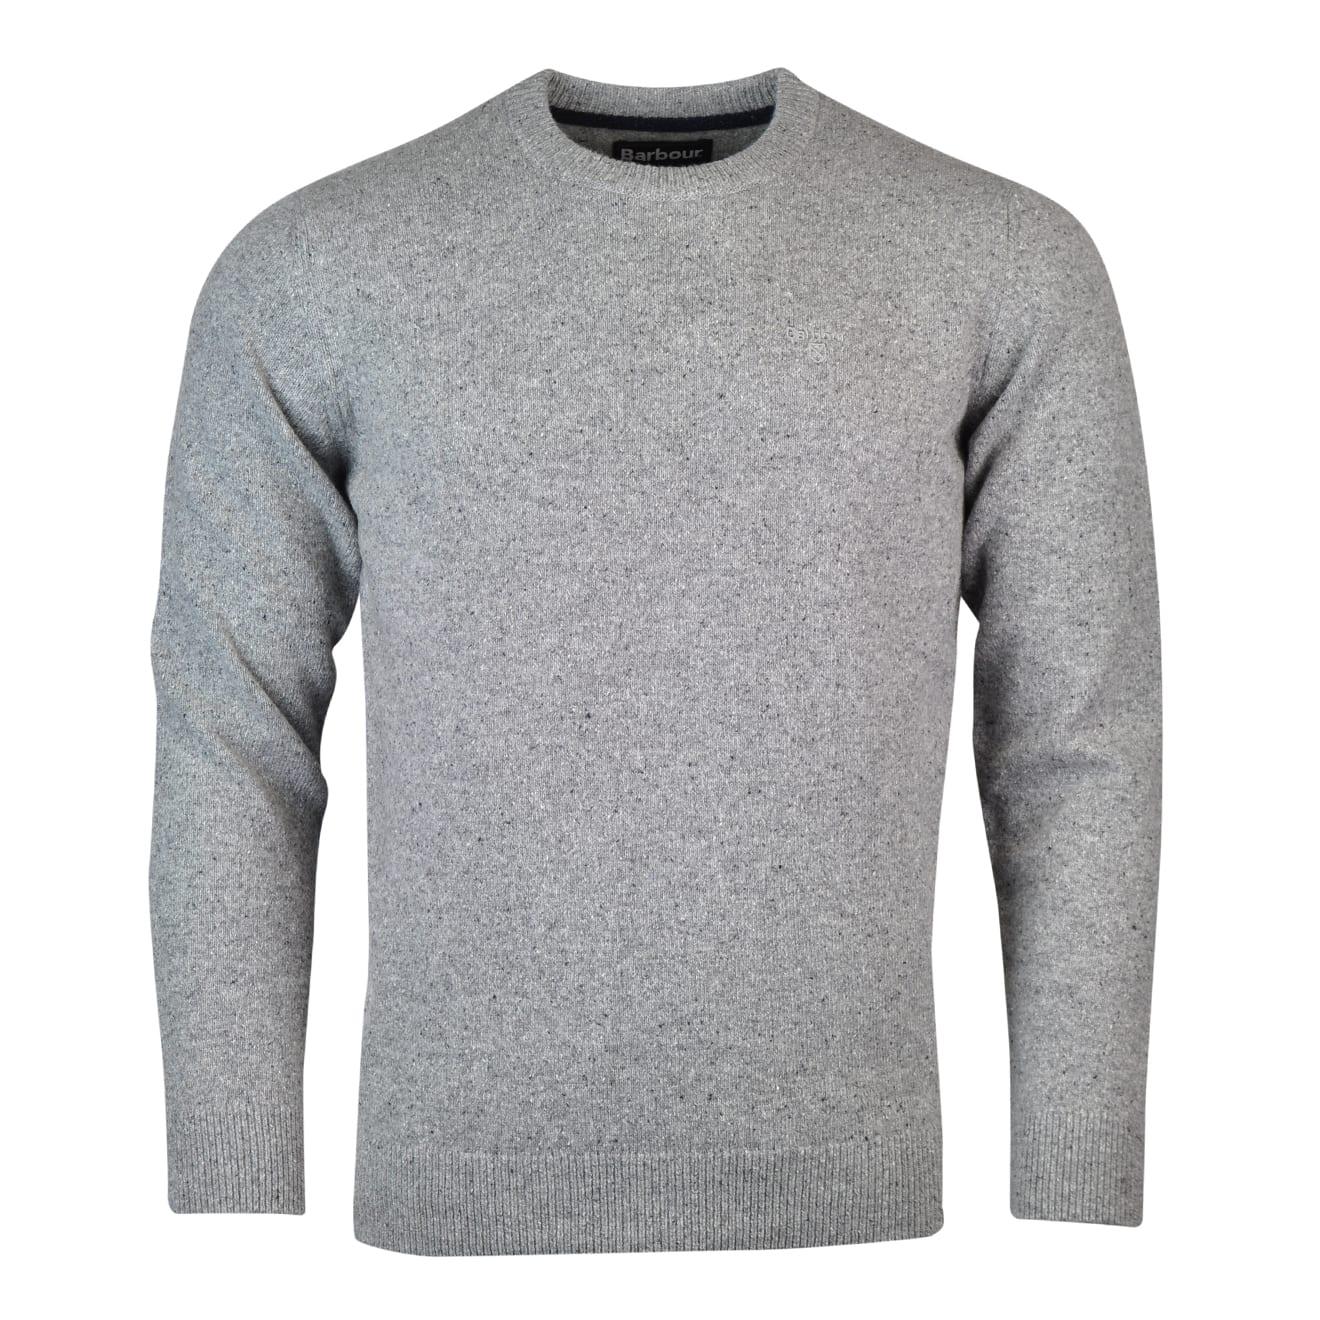 Barbour Tisbury Crew Neck Sweater Light Grey